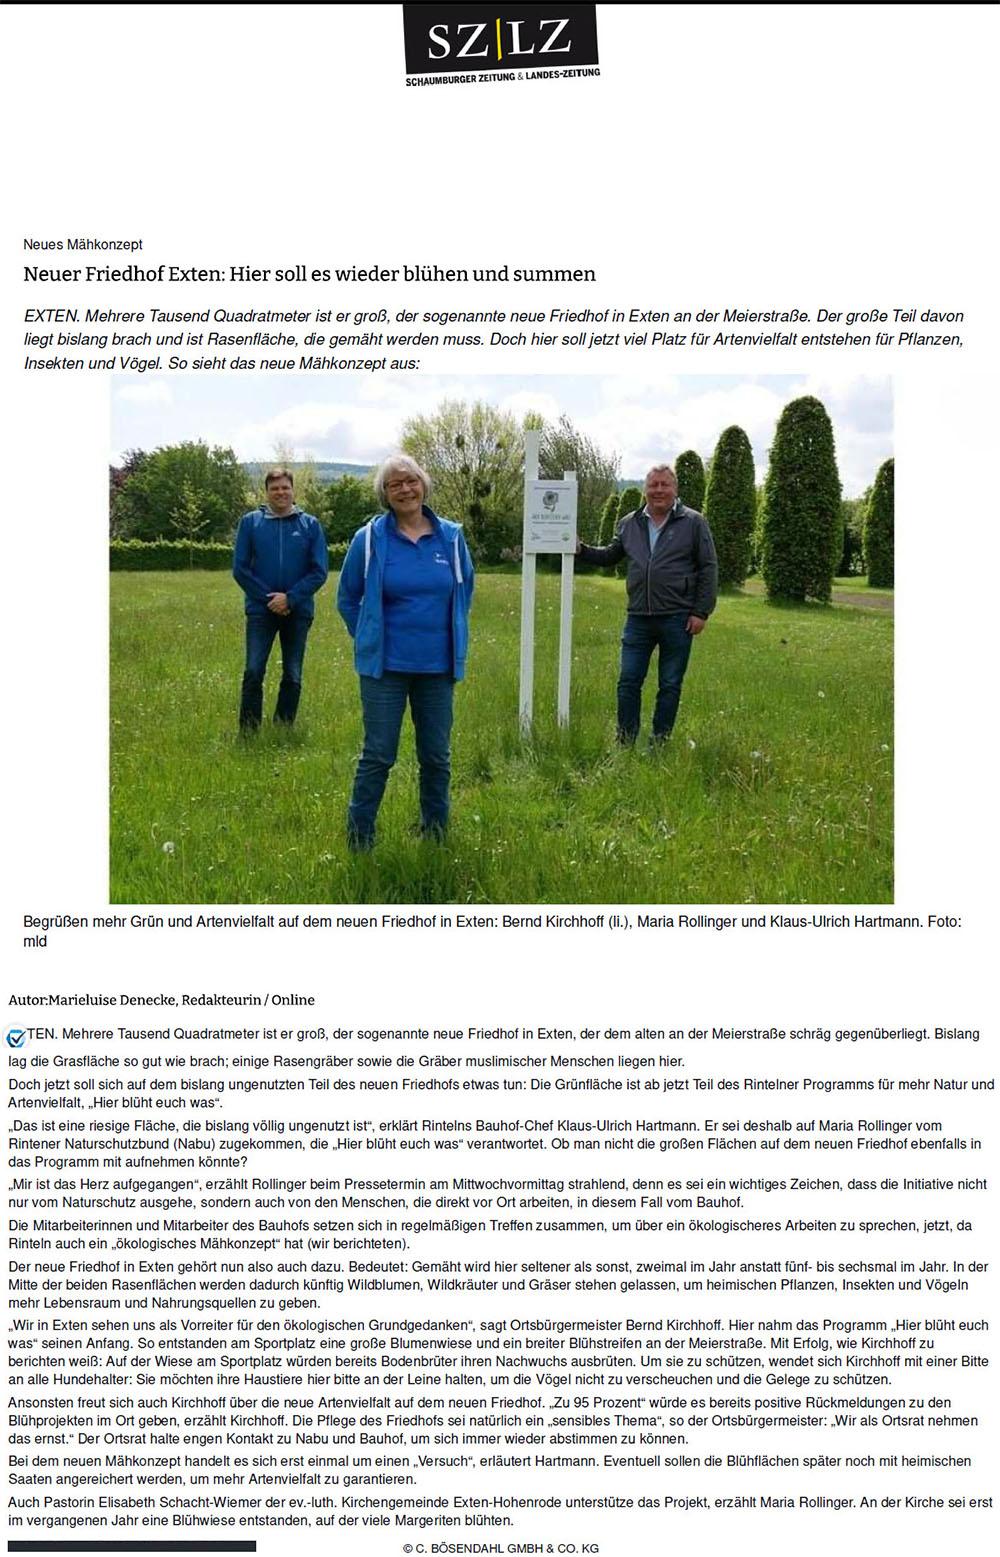 Neuer Friedhof Exten Hier blüht euch was! - (Zeitungsartikel 26.06.2021)